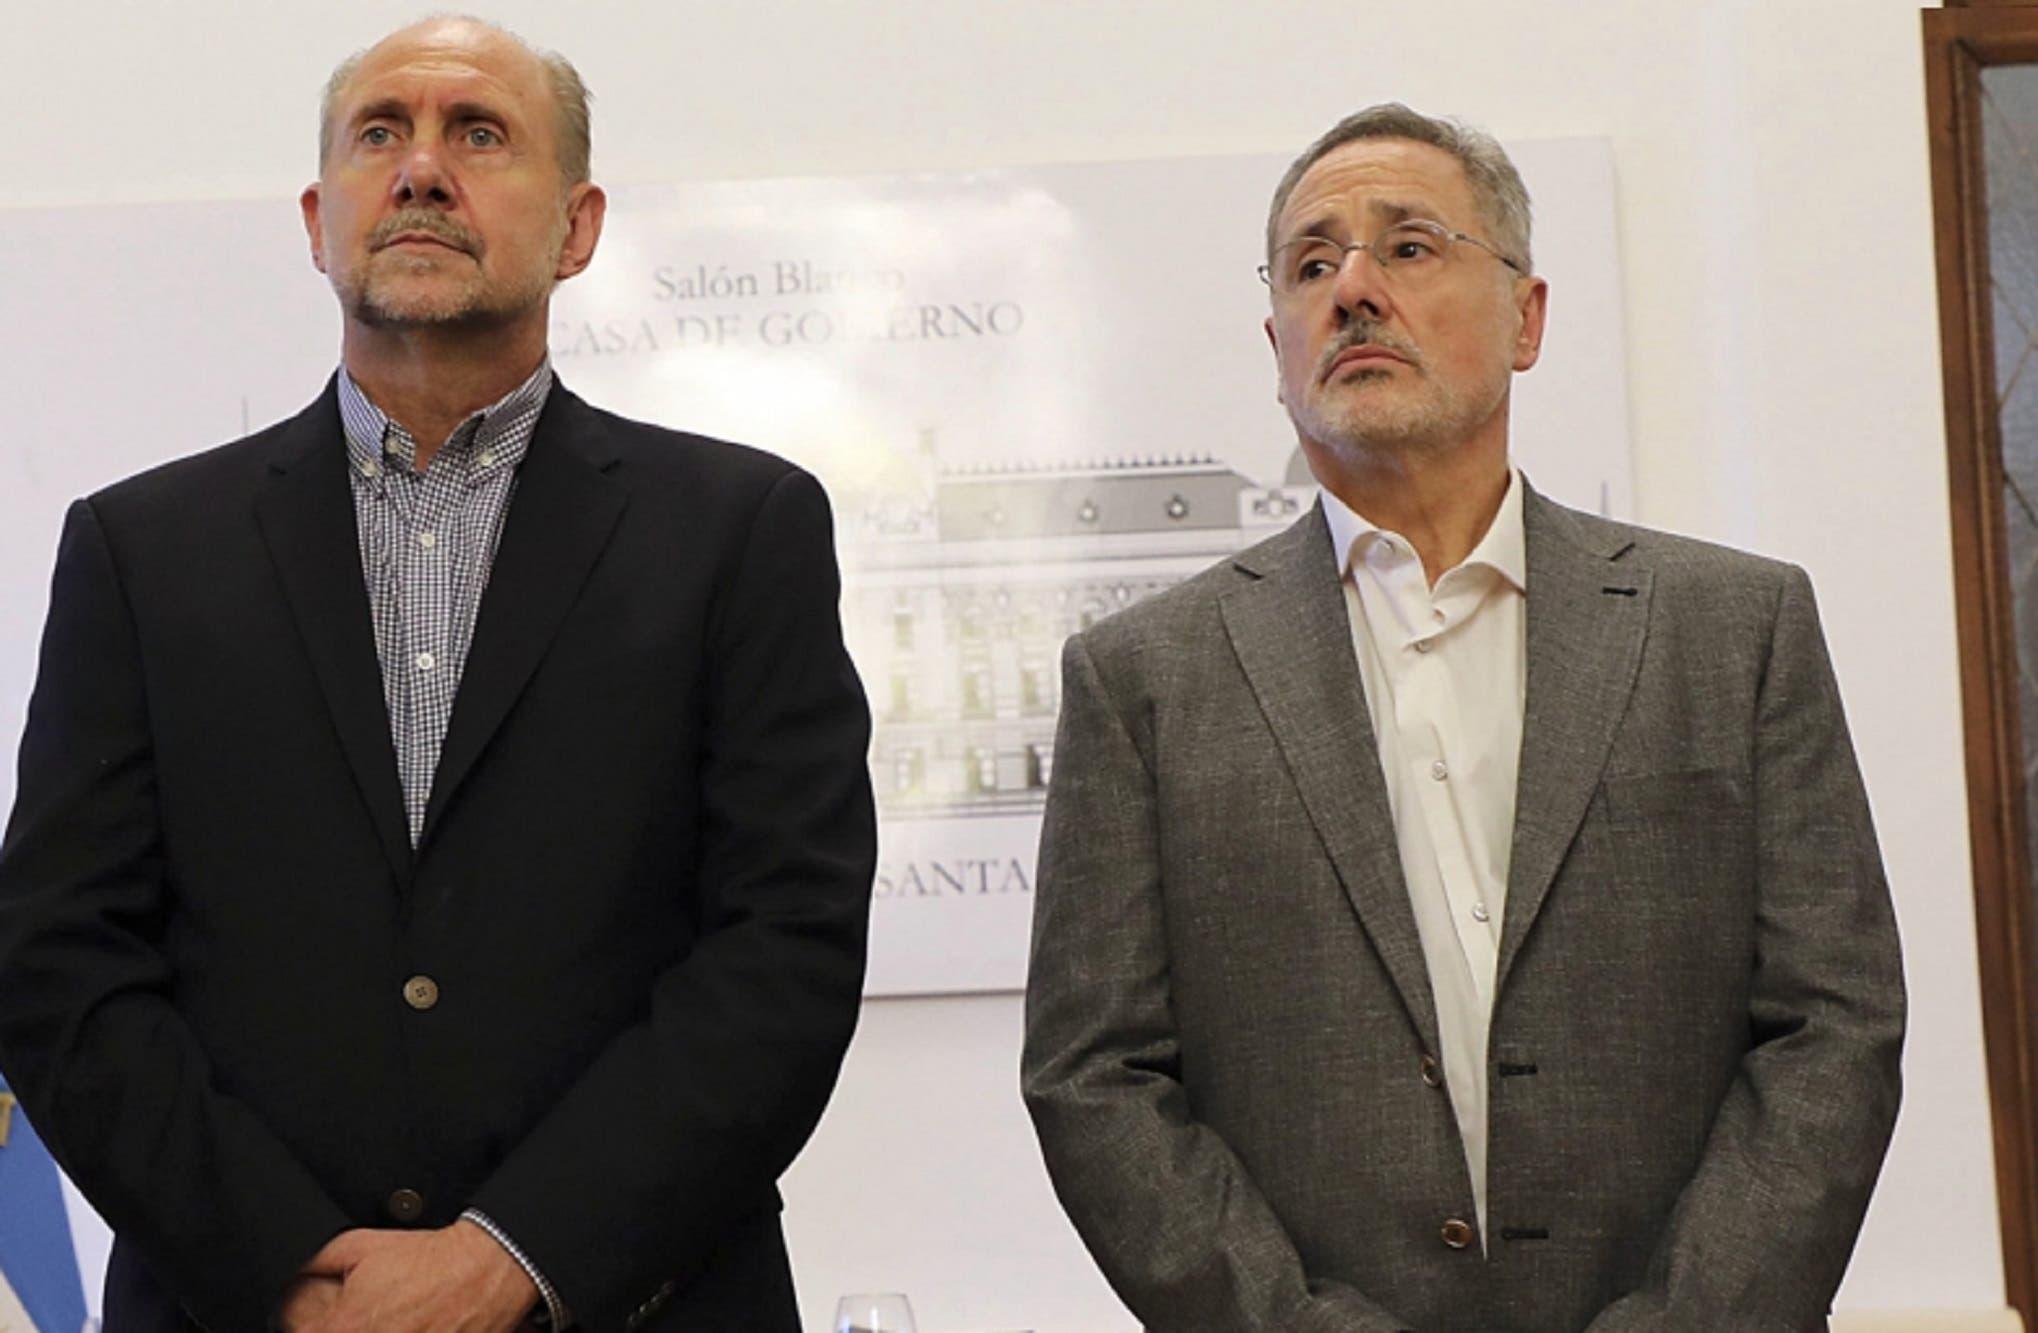 El gobernador de Santa Fe, Omar Perotti, tiene coronavirus